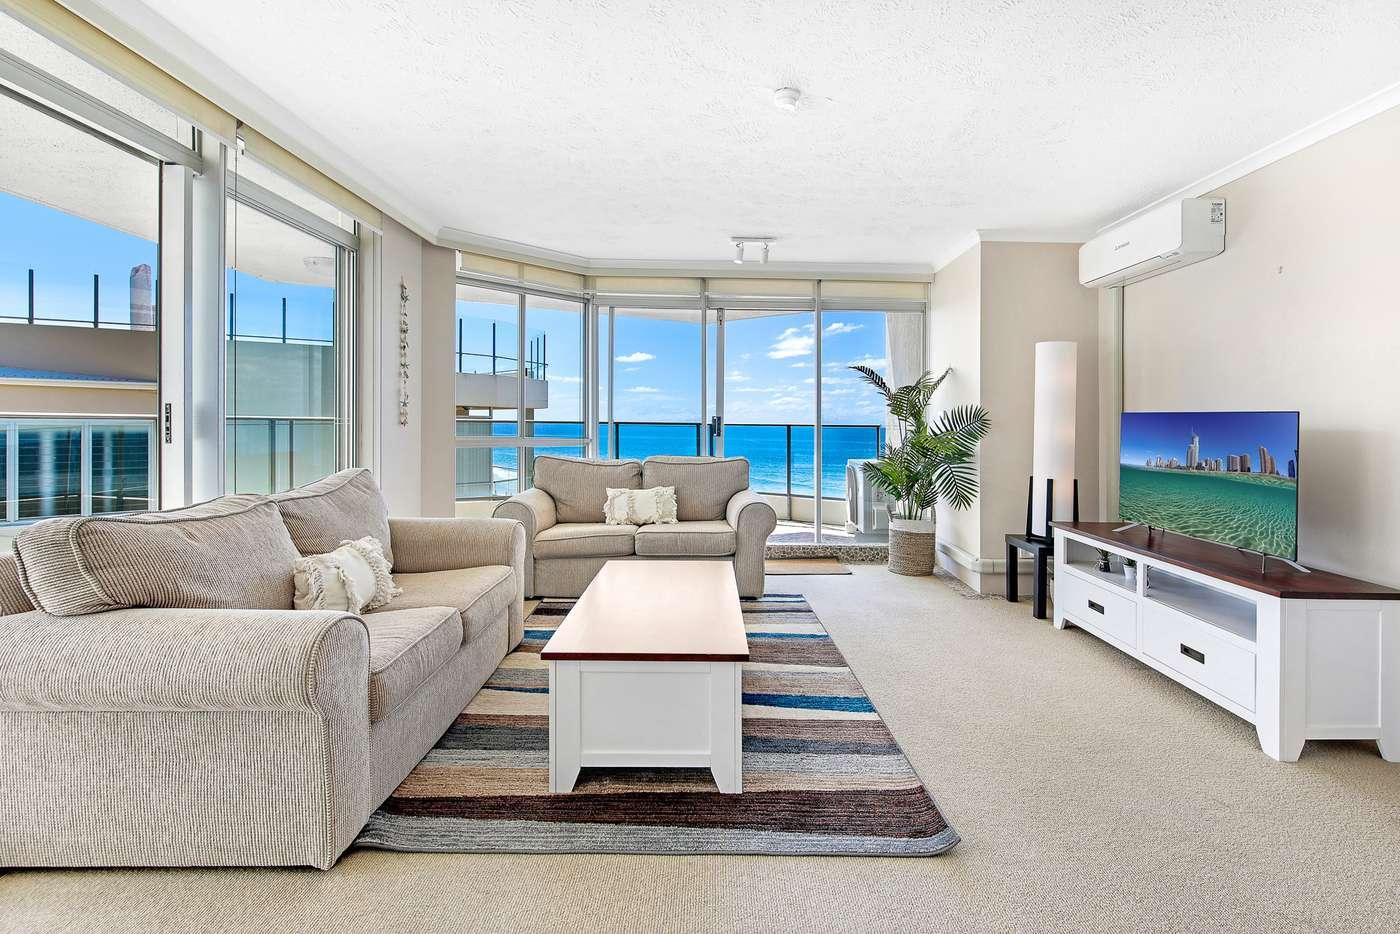 Main view of Homely unit listing, 26/67-71 Albatross Avenue, Mermaid Beach QLD 4218